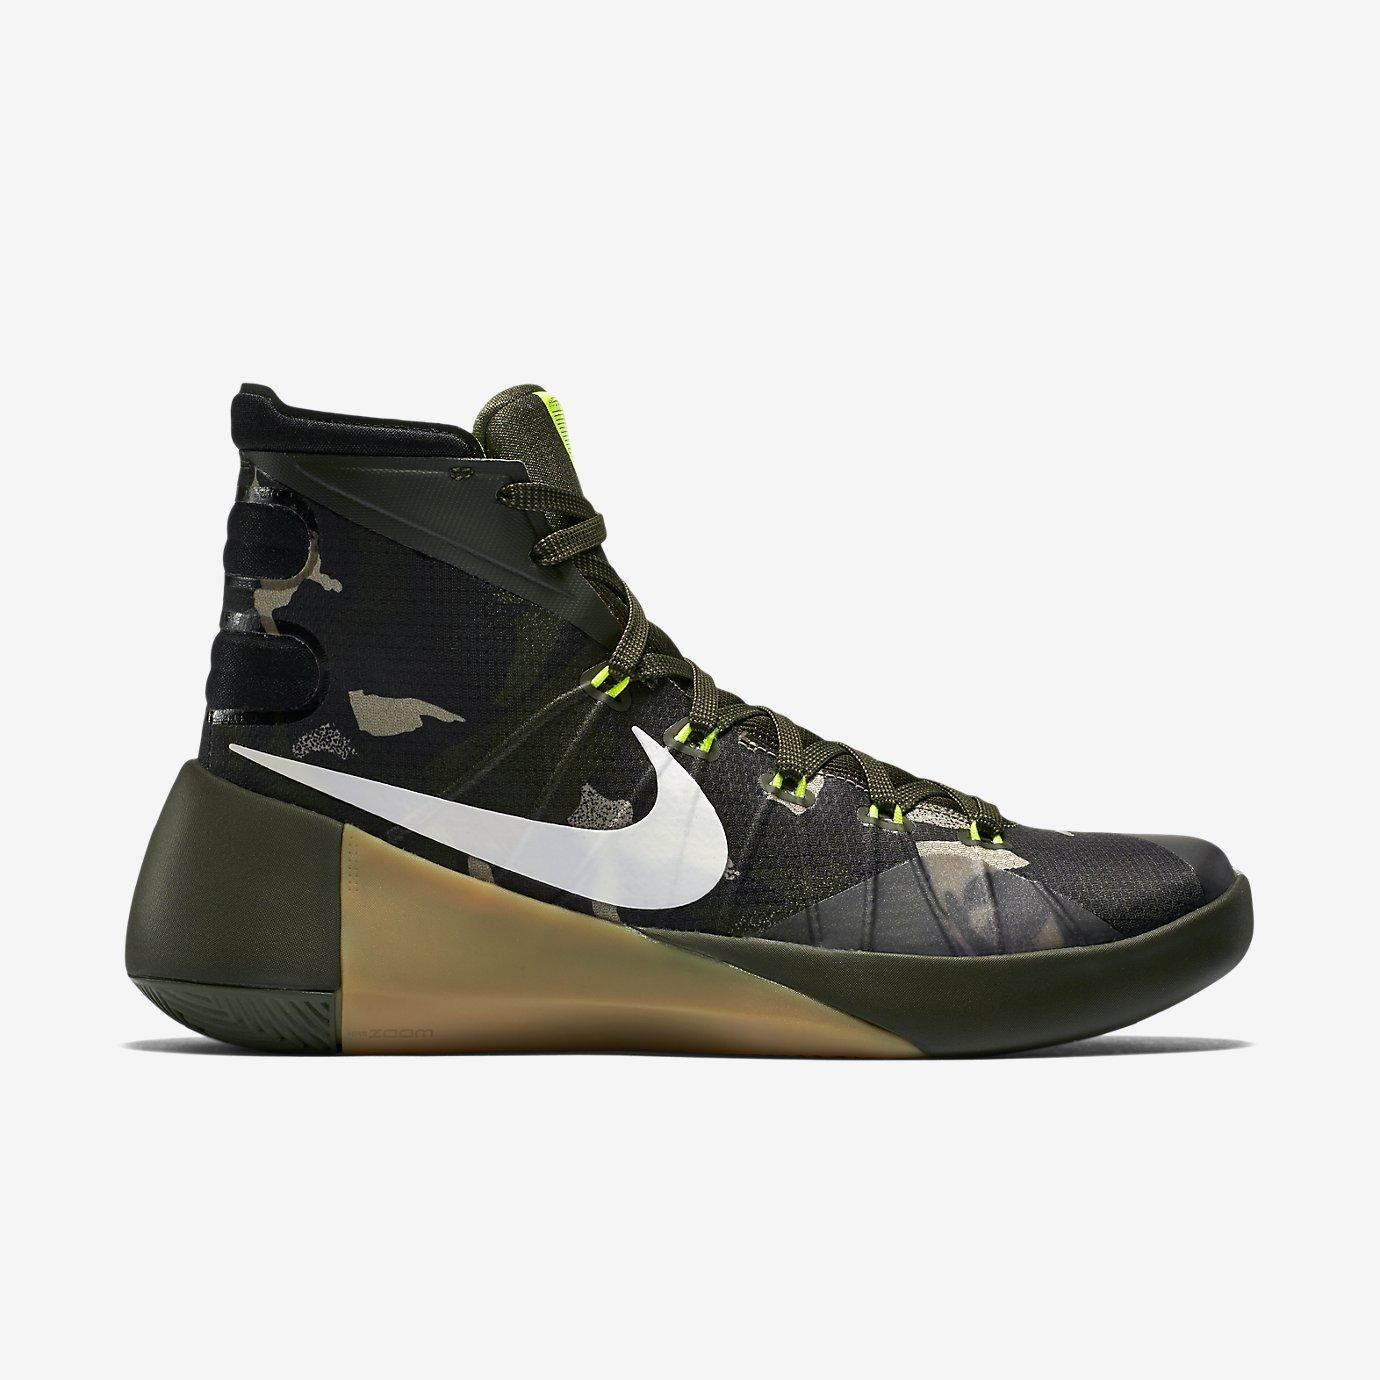 NIKE Men's Hyperdunk 2015 Basketball Sneaker B00RKDM1JI 13 M US|Cargo Khaki/Sequoia/Bamboo/Sail